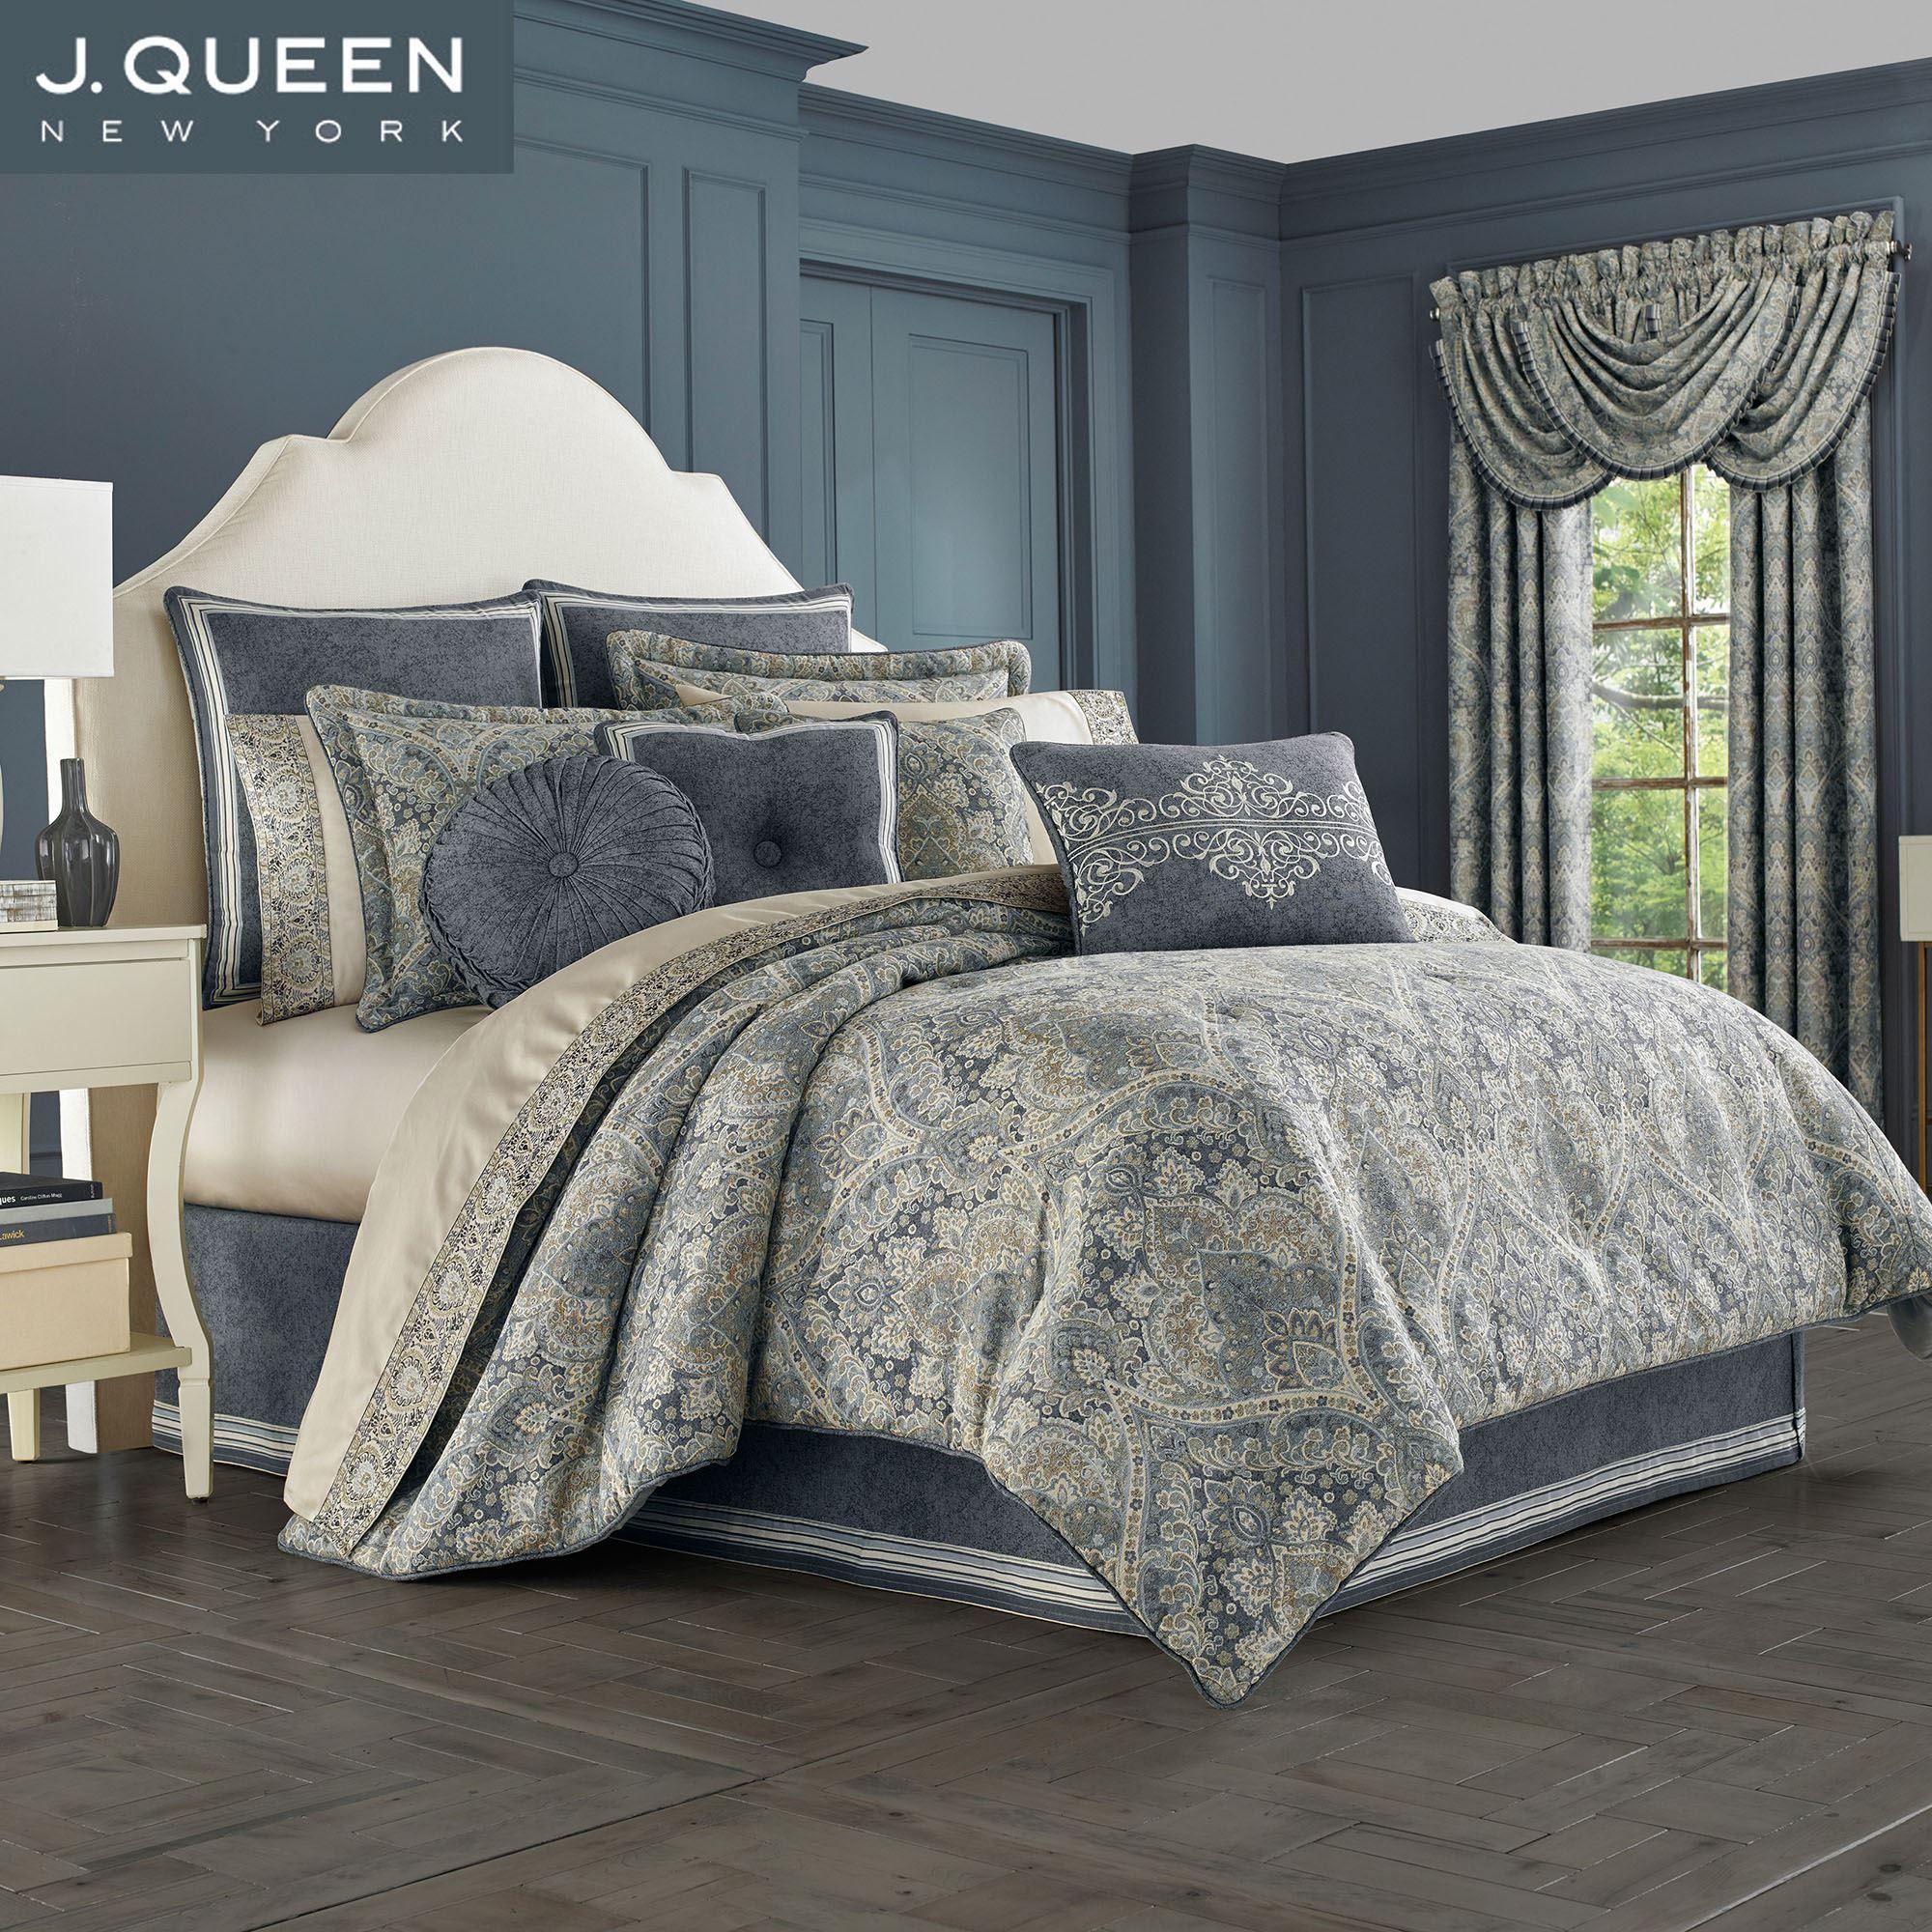 Miranda Steel Blue Damask forter Bedding by J Queen New York